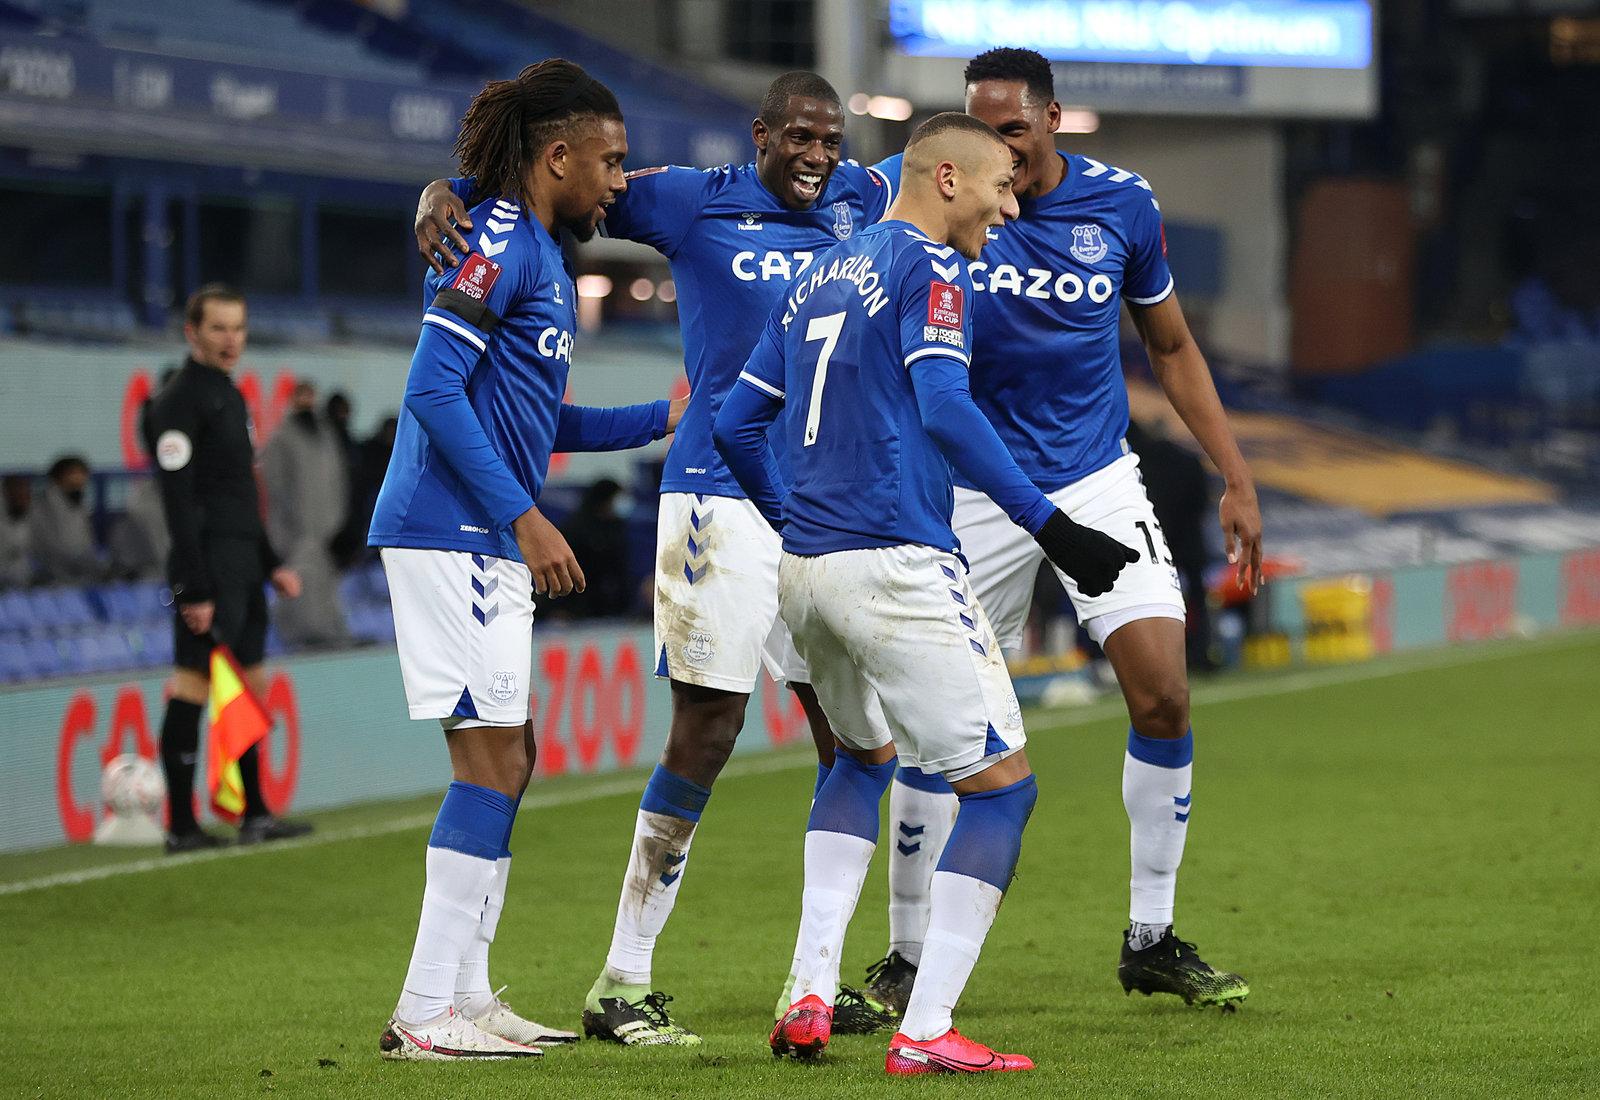 El Everton de Ancelotti elimina al Tottenham de Mourinho con locura de goles